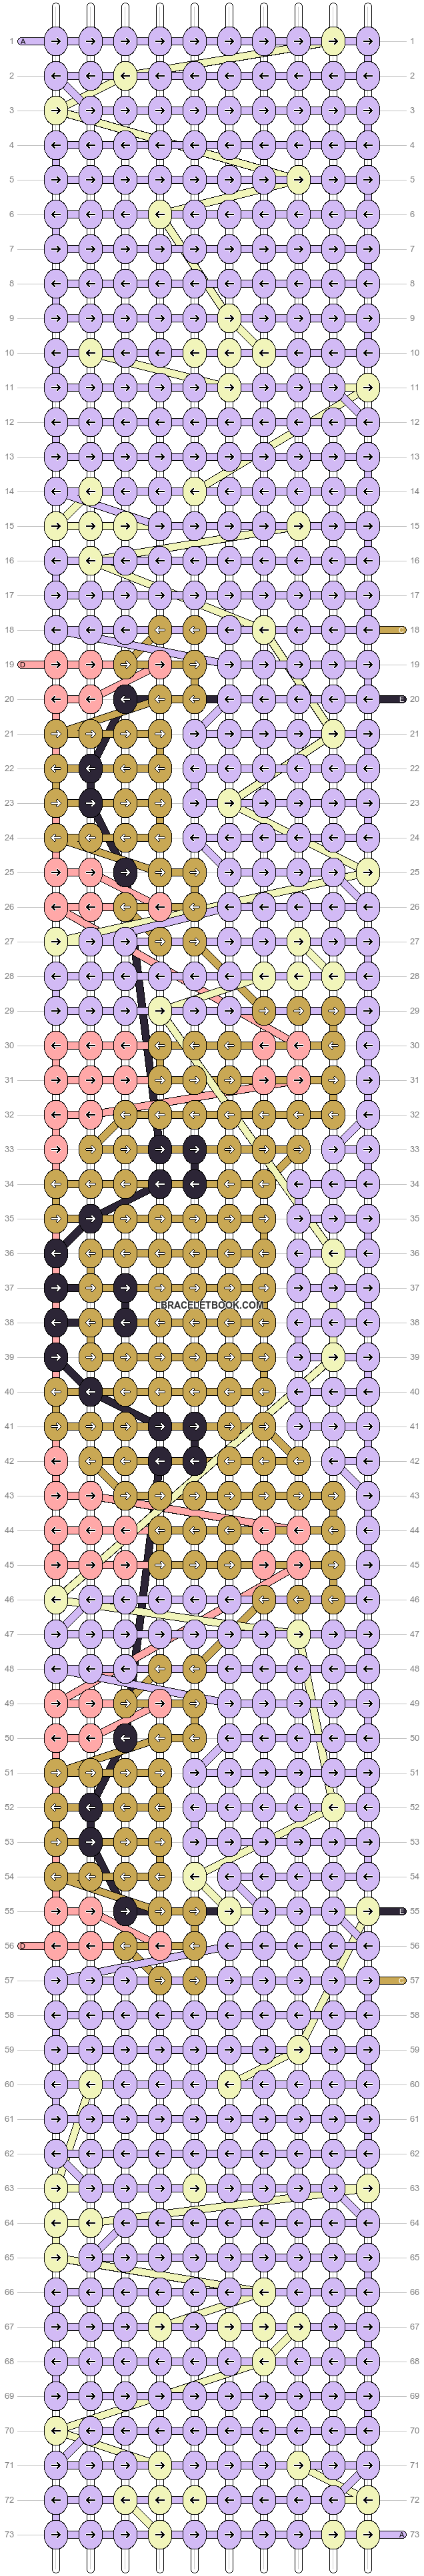 Alpha pattern #89827 pattern